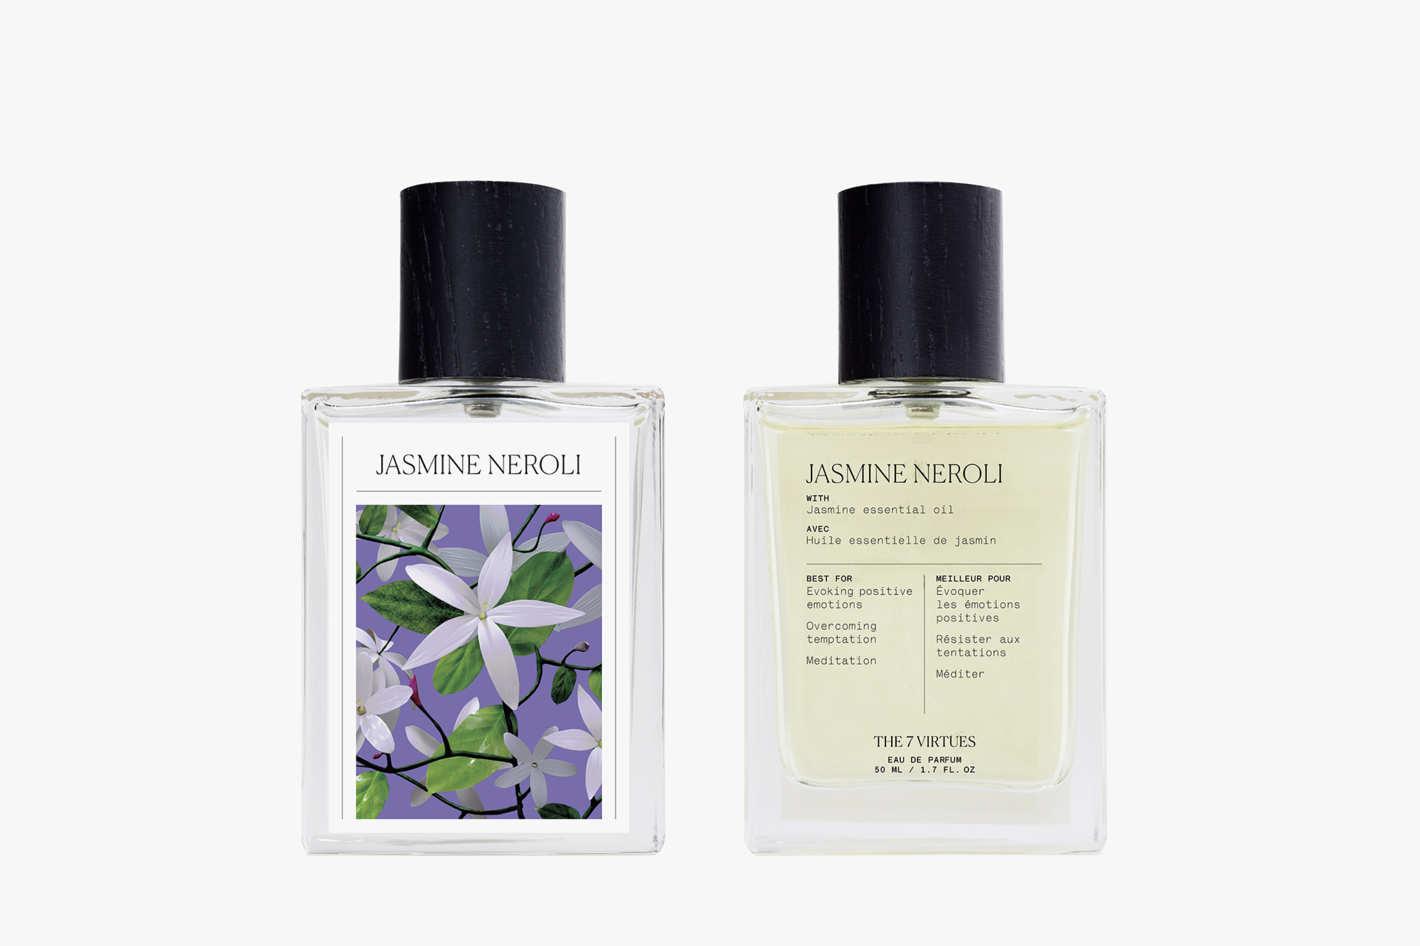 The 7 Virtues Jasmine Neroli Eau de Parfum